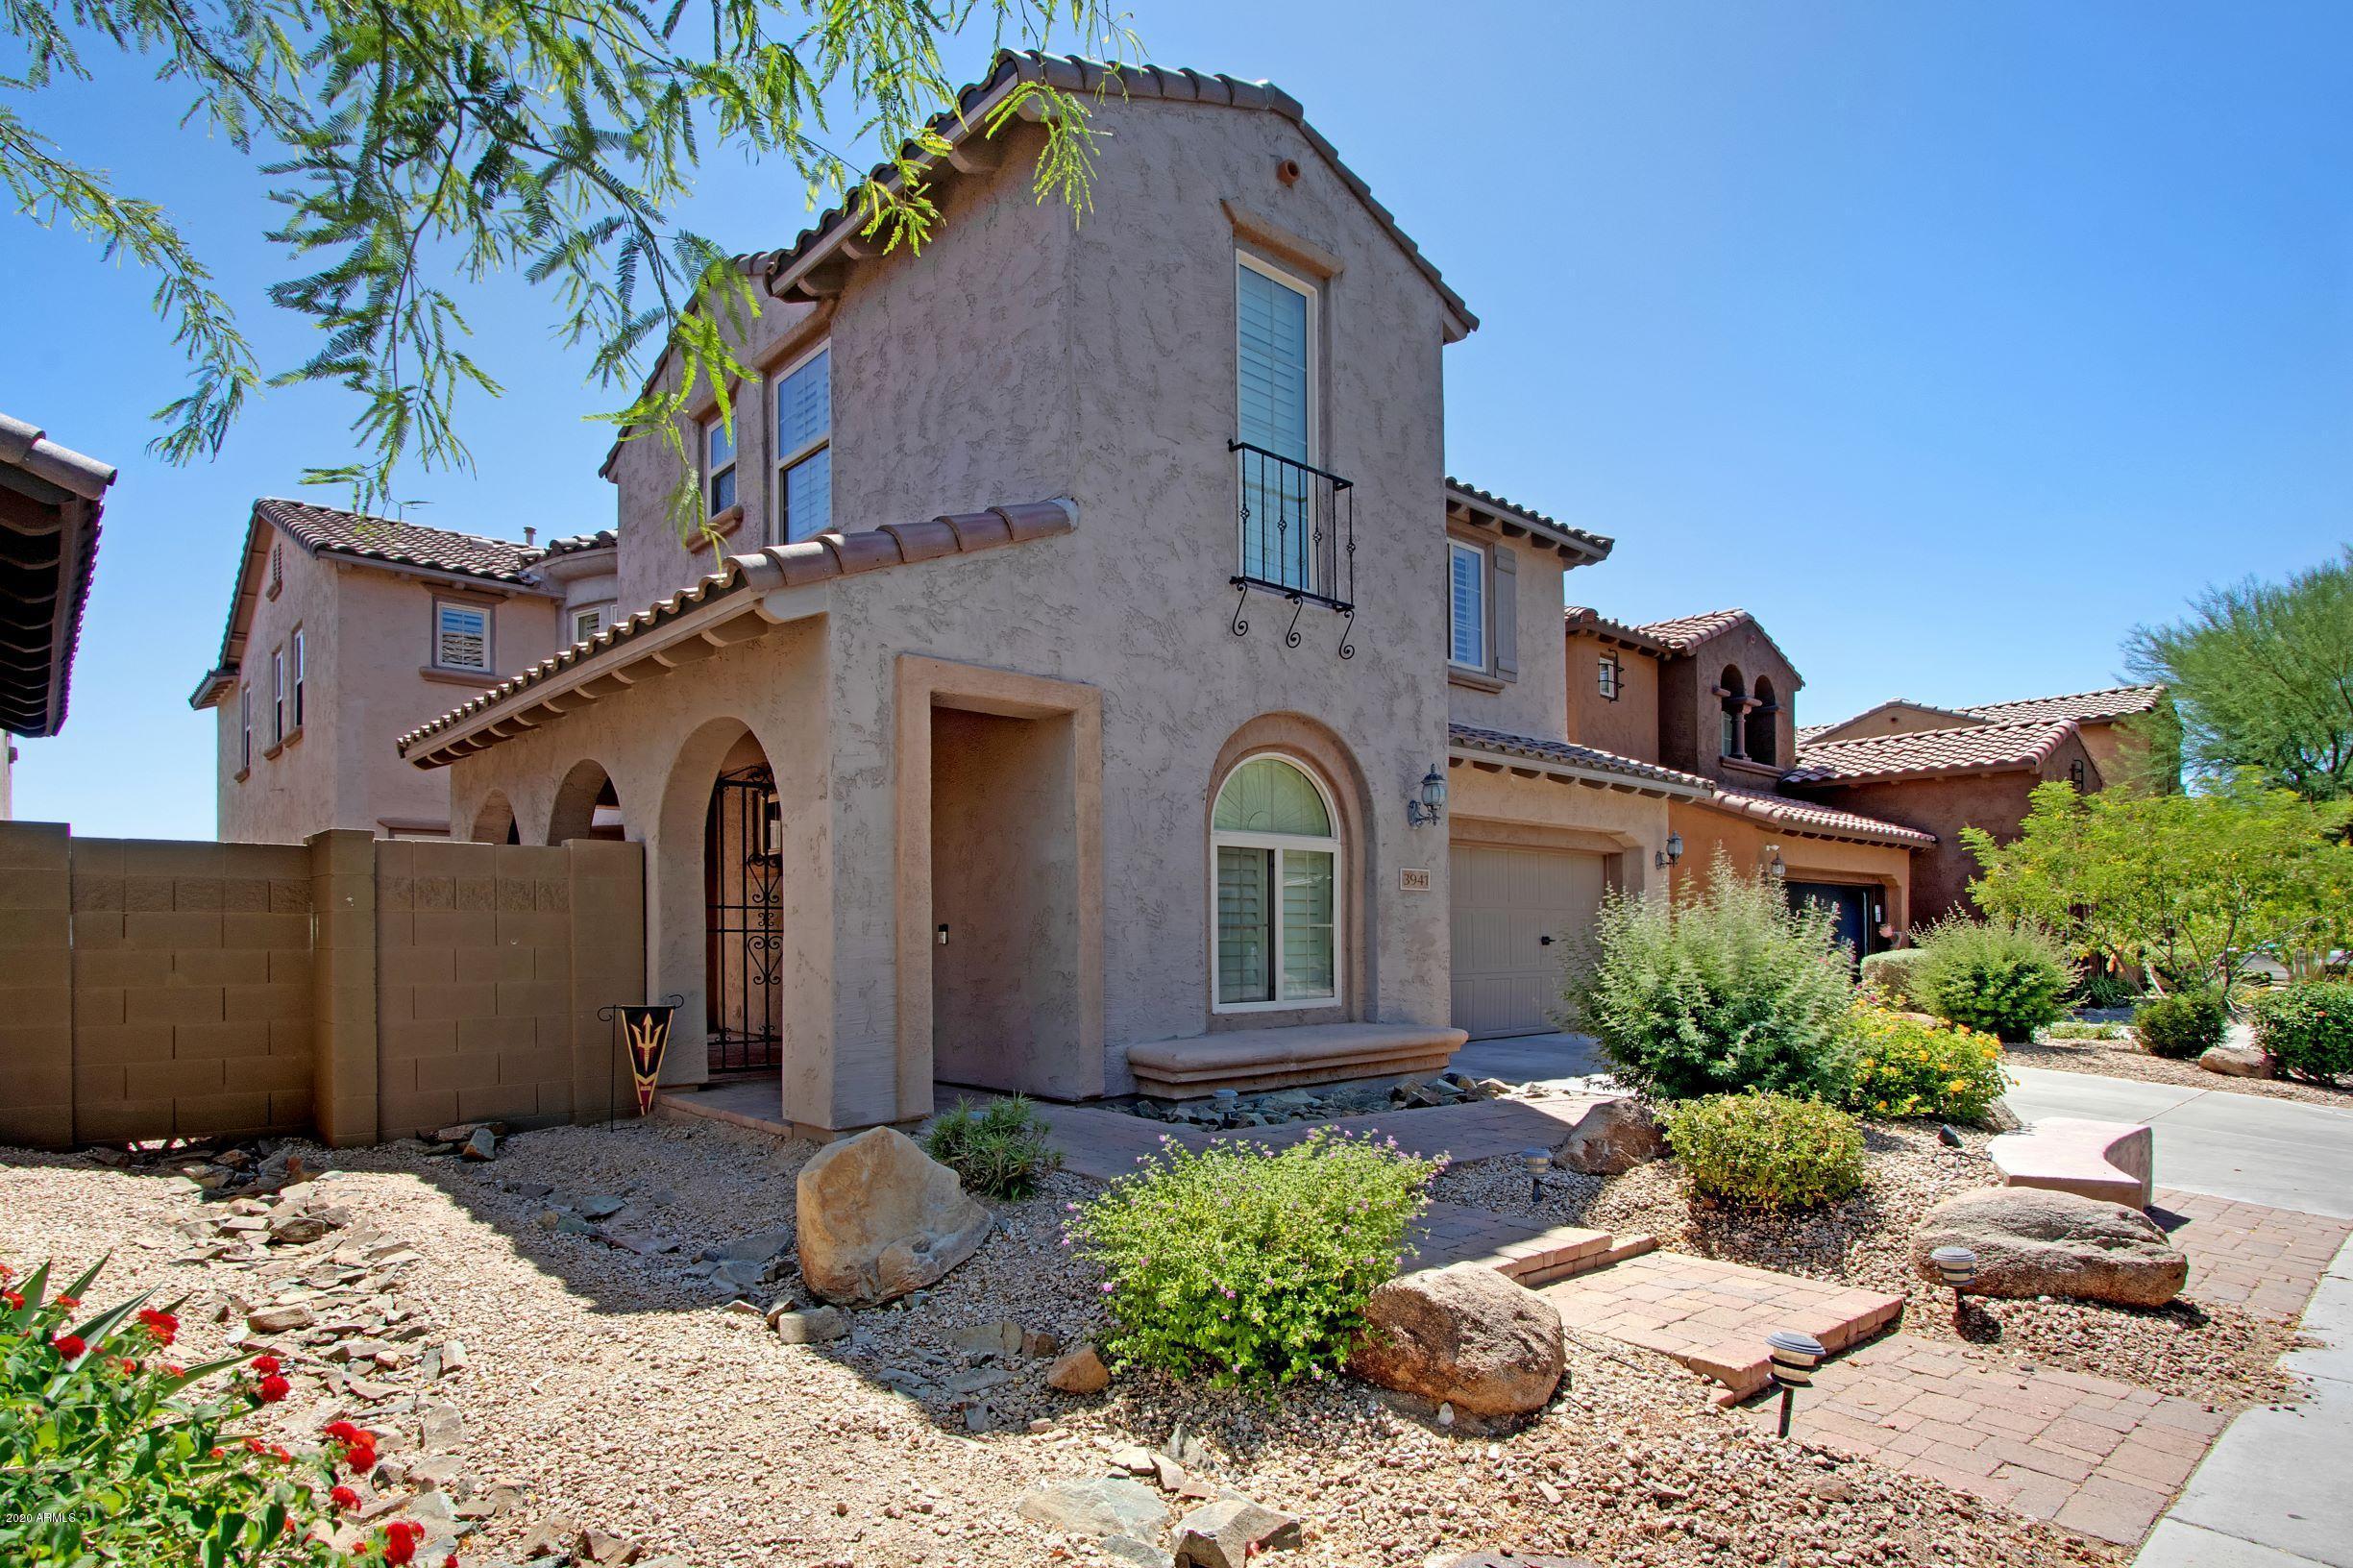 MLS 6102240 Phoenix Metro Area, Phoenix, AZ 85050 Homes w/ Casitas in Phoenix